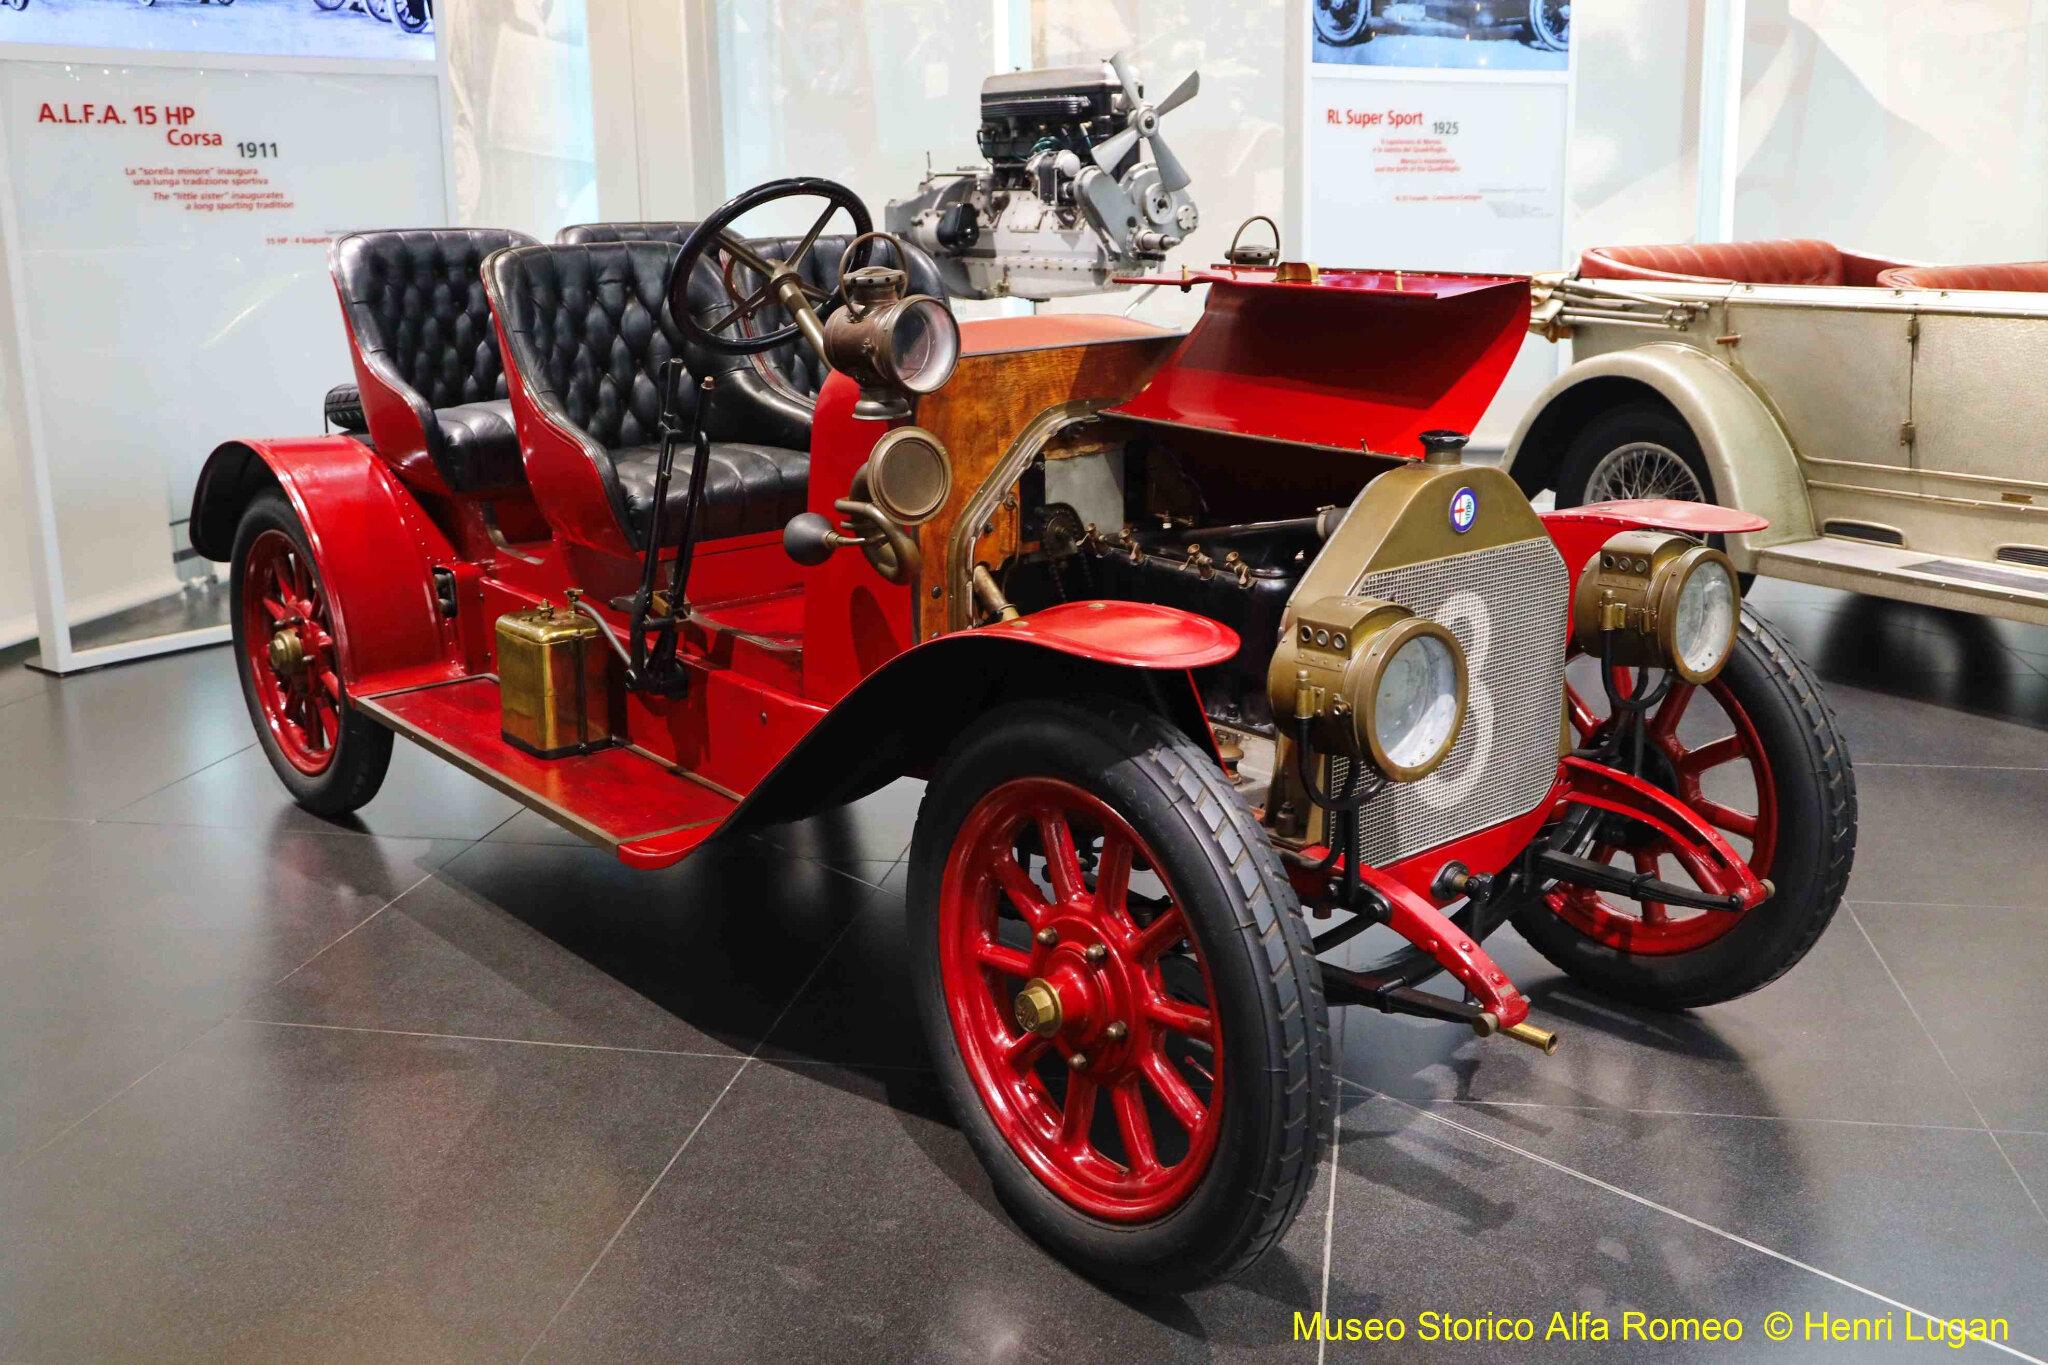 Alfa 15 HP Corsa_02 - 1911 [I] HL_GF